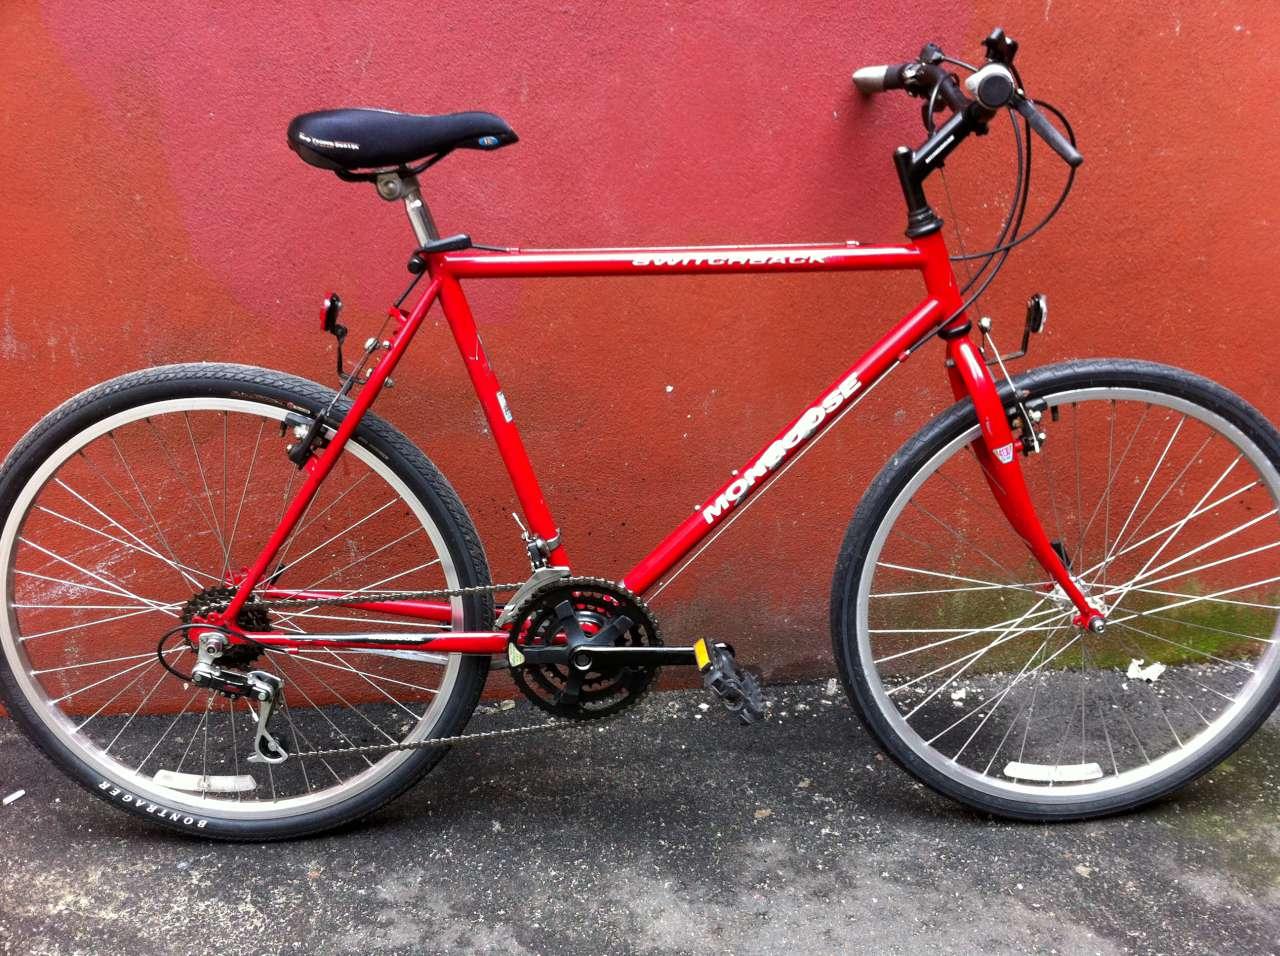 Bike Boom Refurbished Bikes Mongoose Switchback Mountain Bike-6453